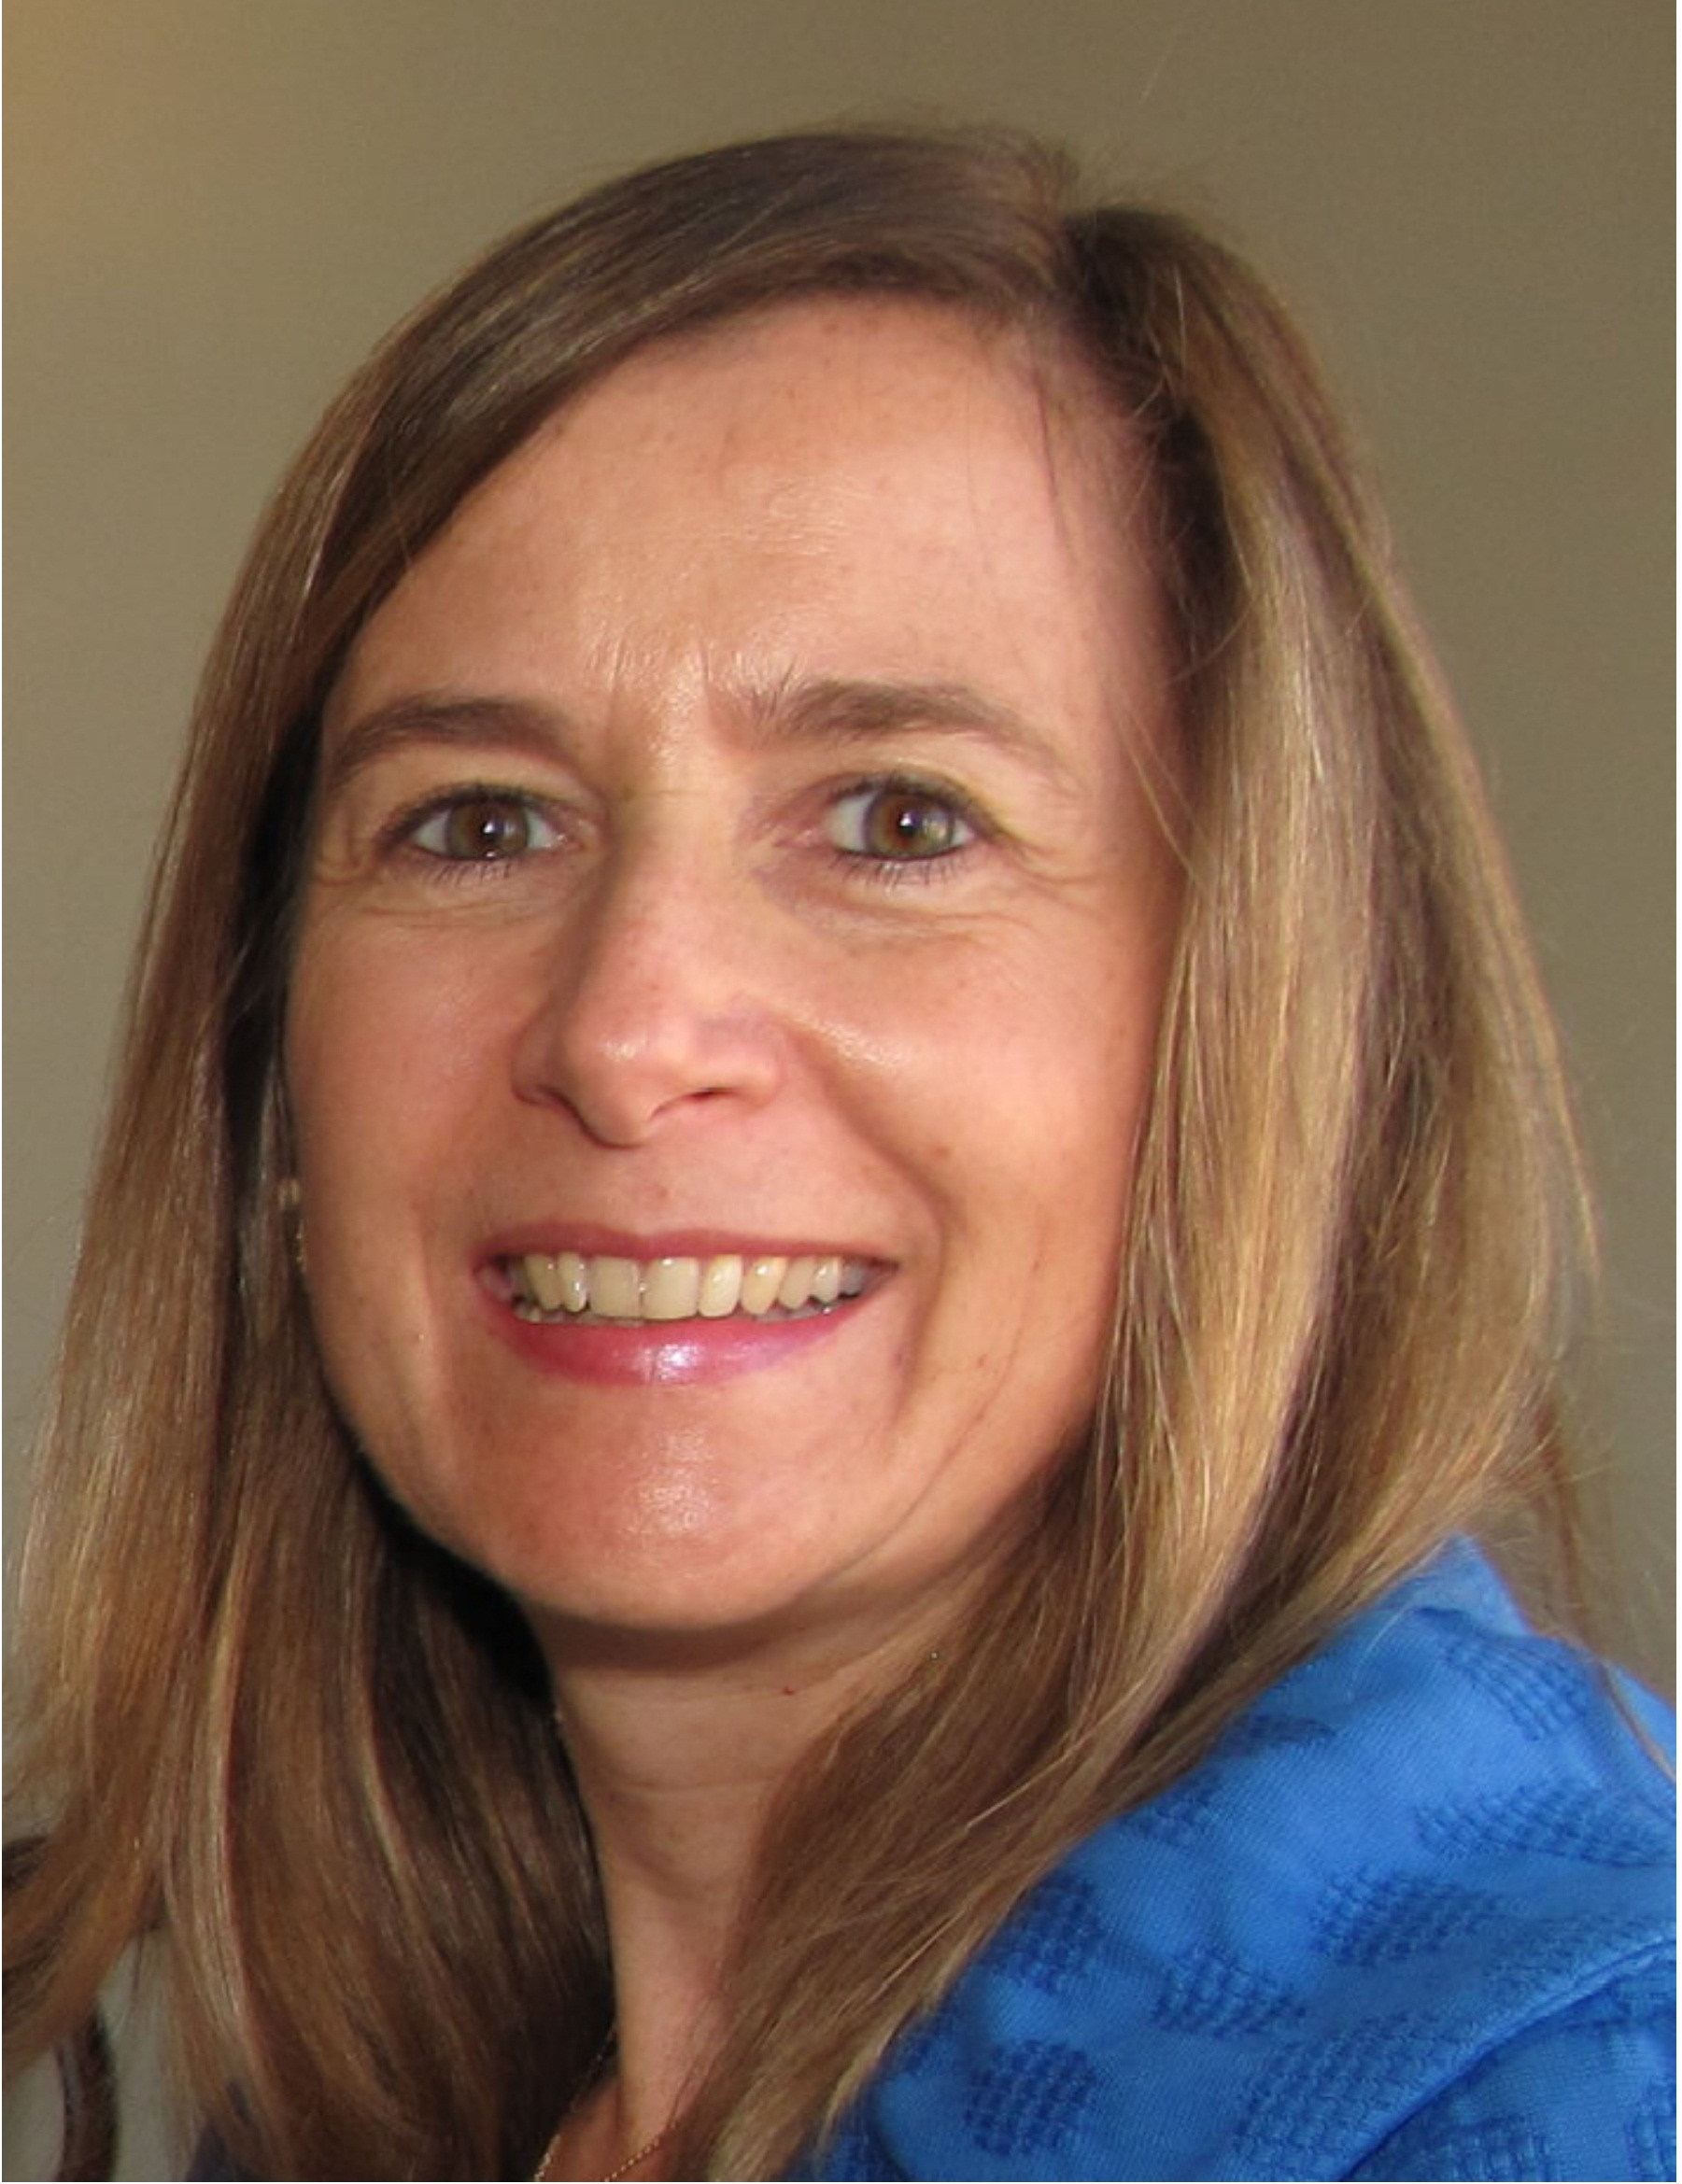 Karen Ticozza